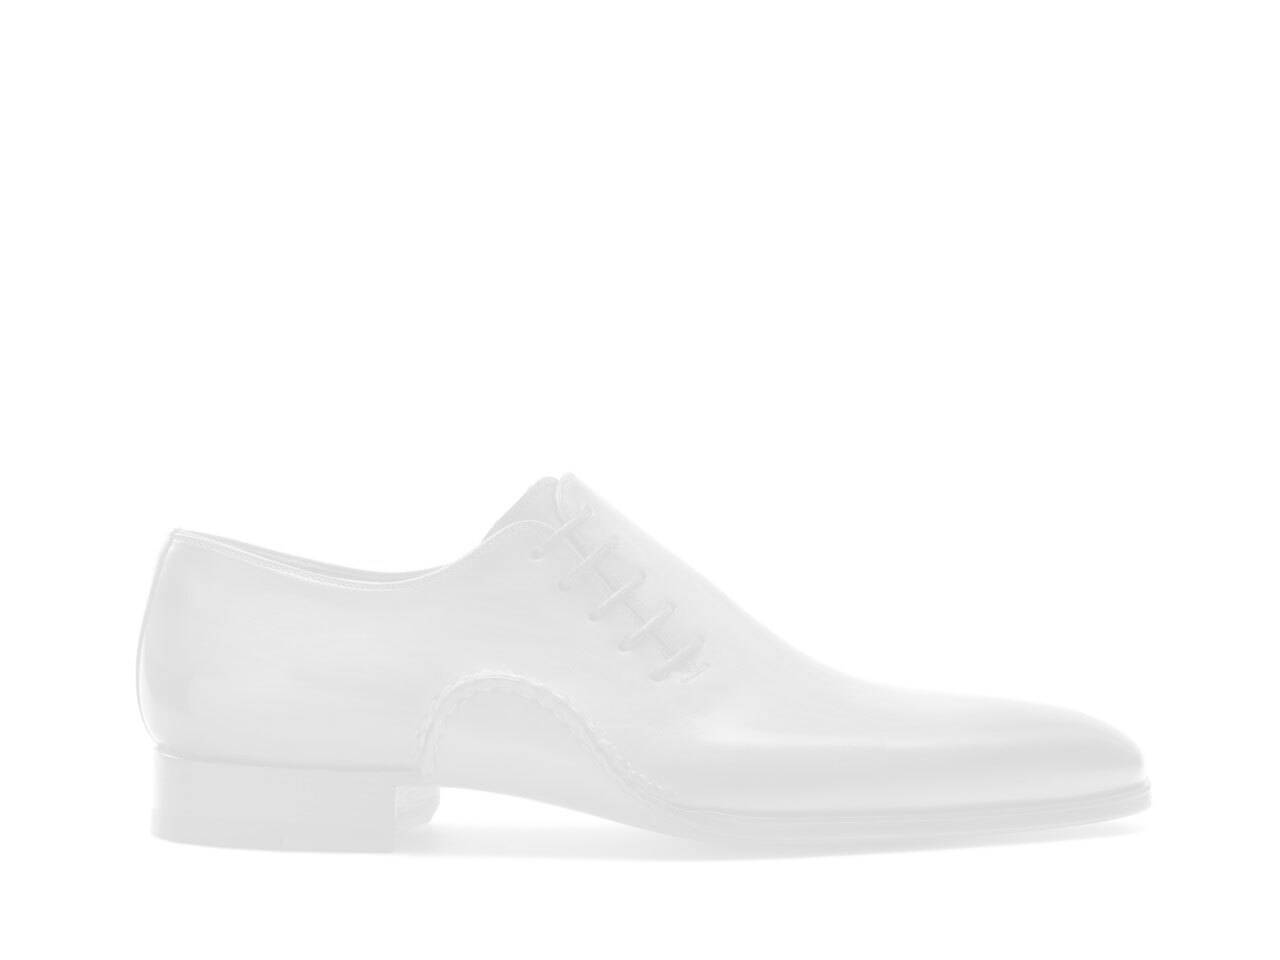 Side view of the Magnanni Dante Wide Black Patent Men's Derby Shoes